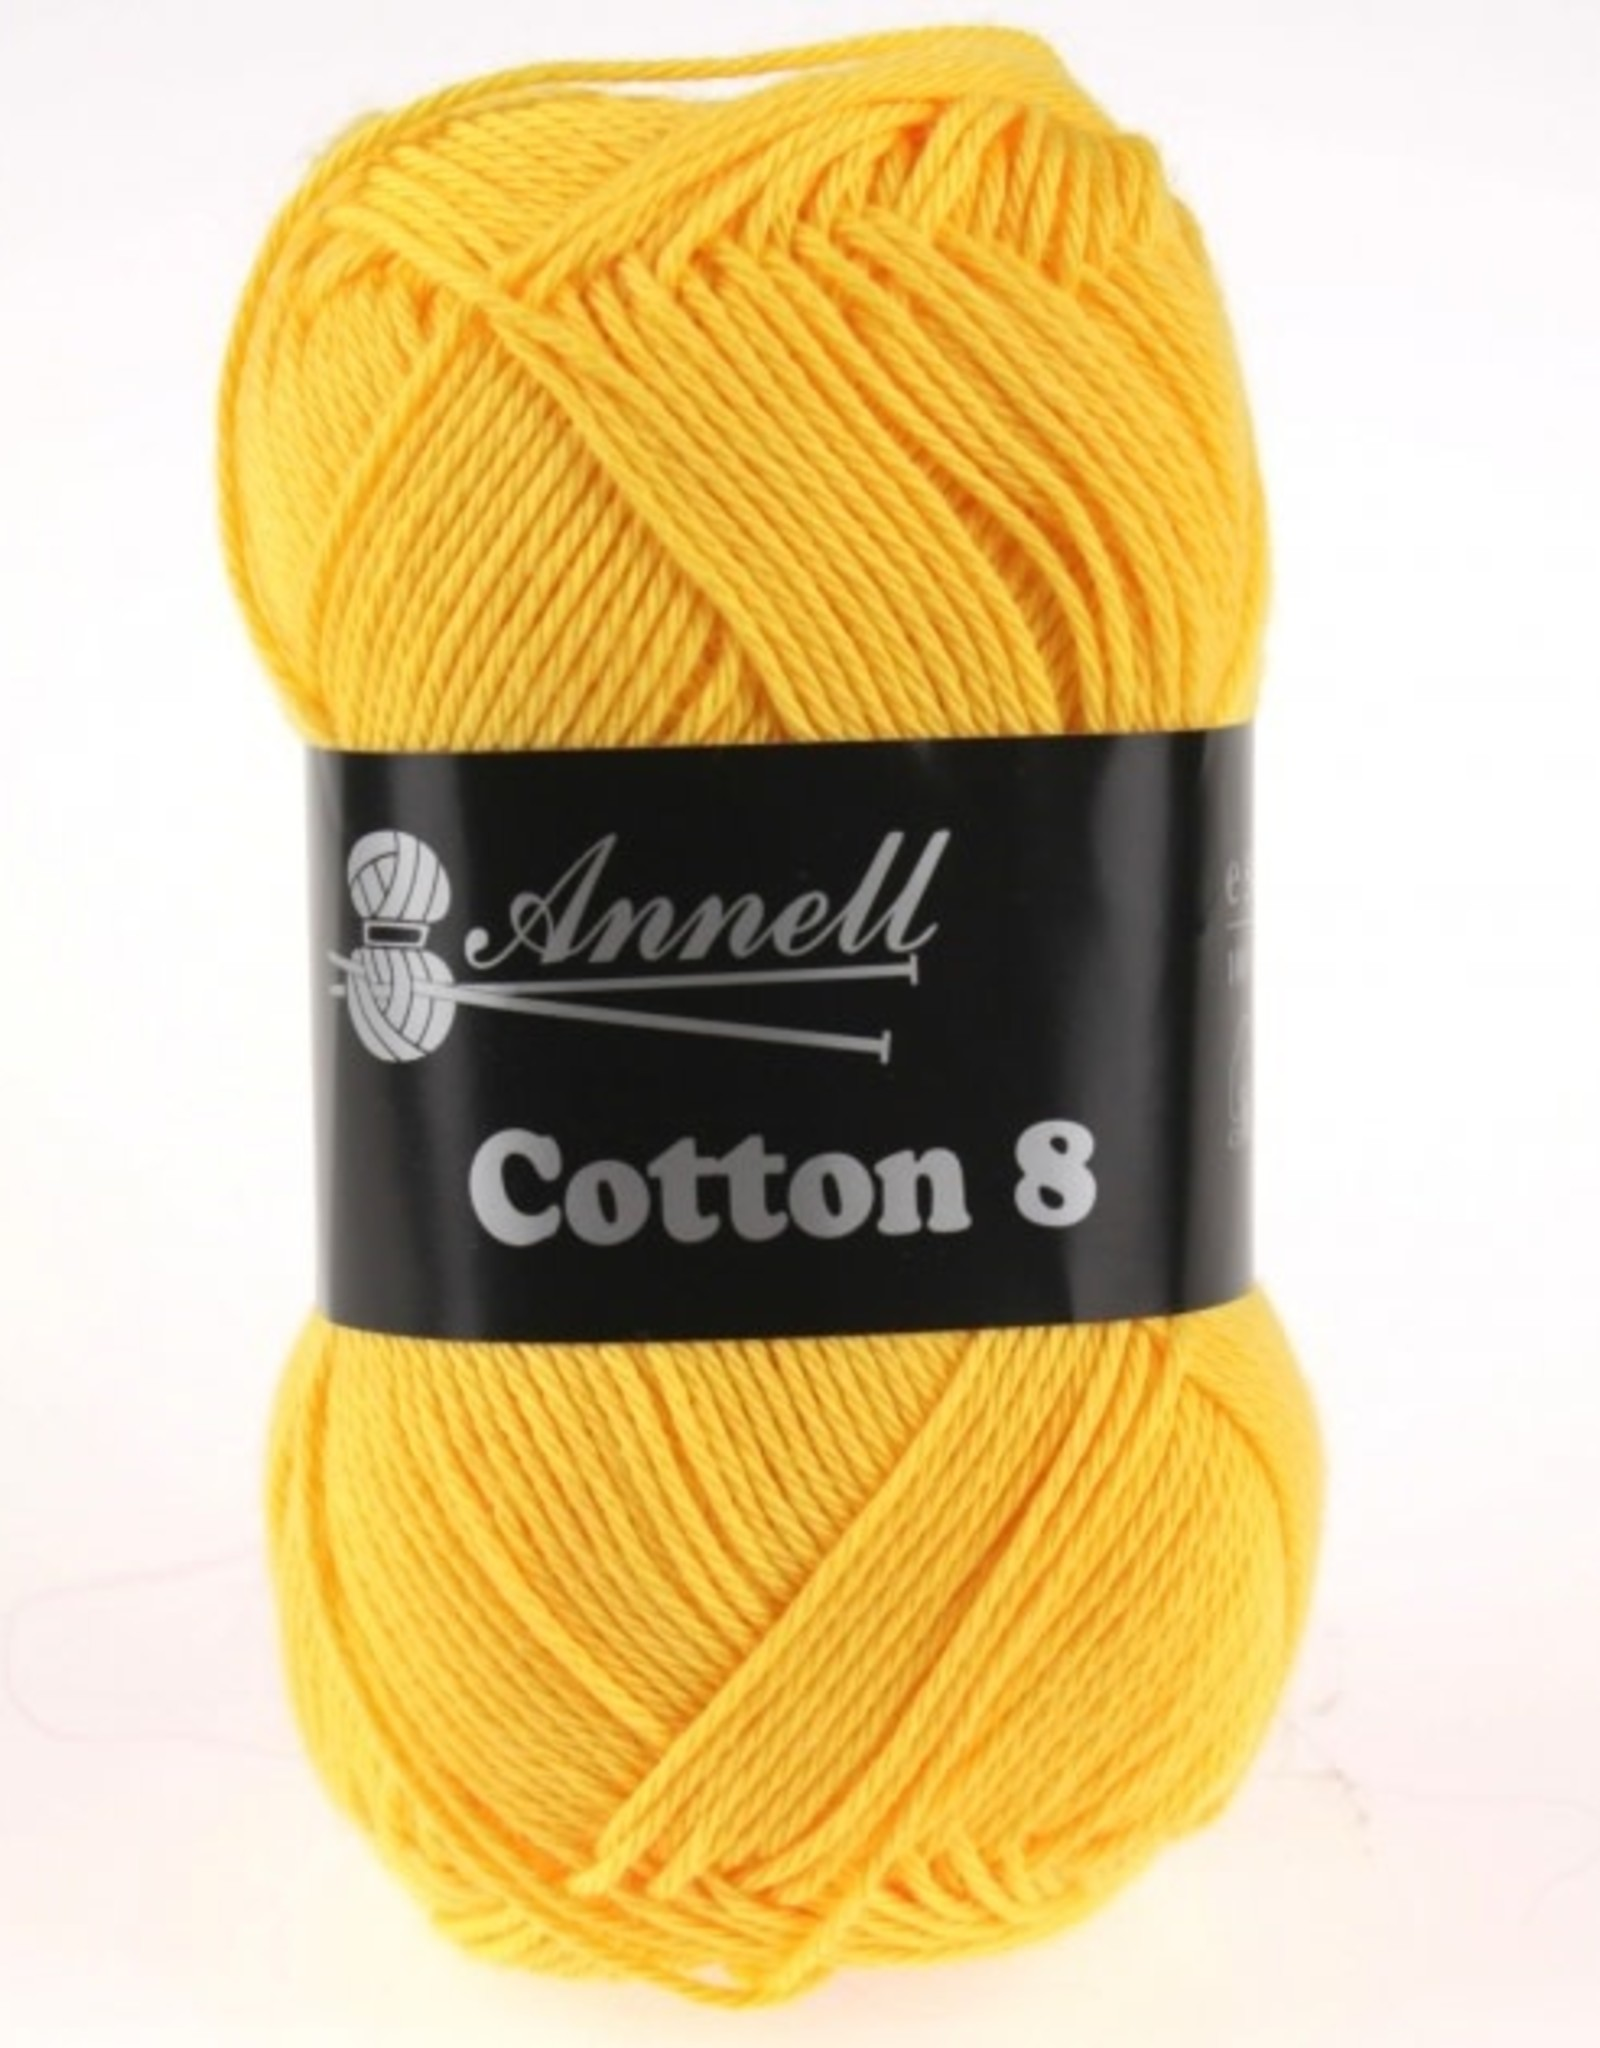 Annell Annell Cotton 8 5